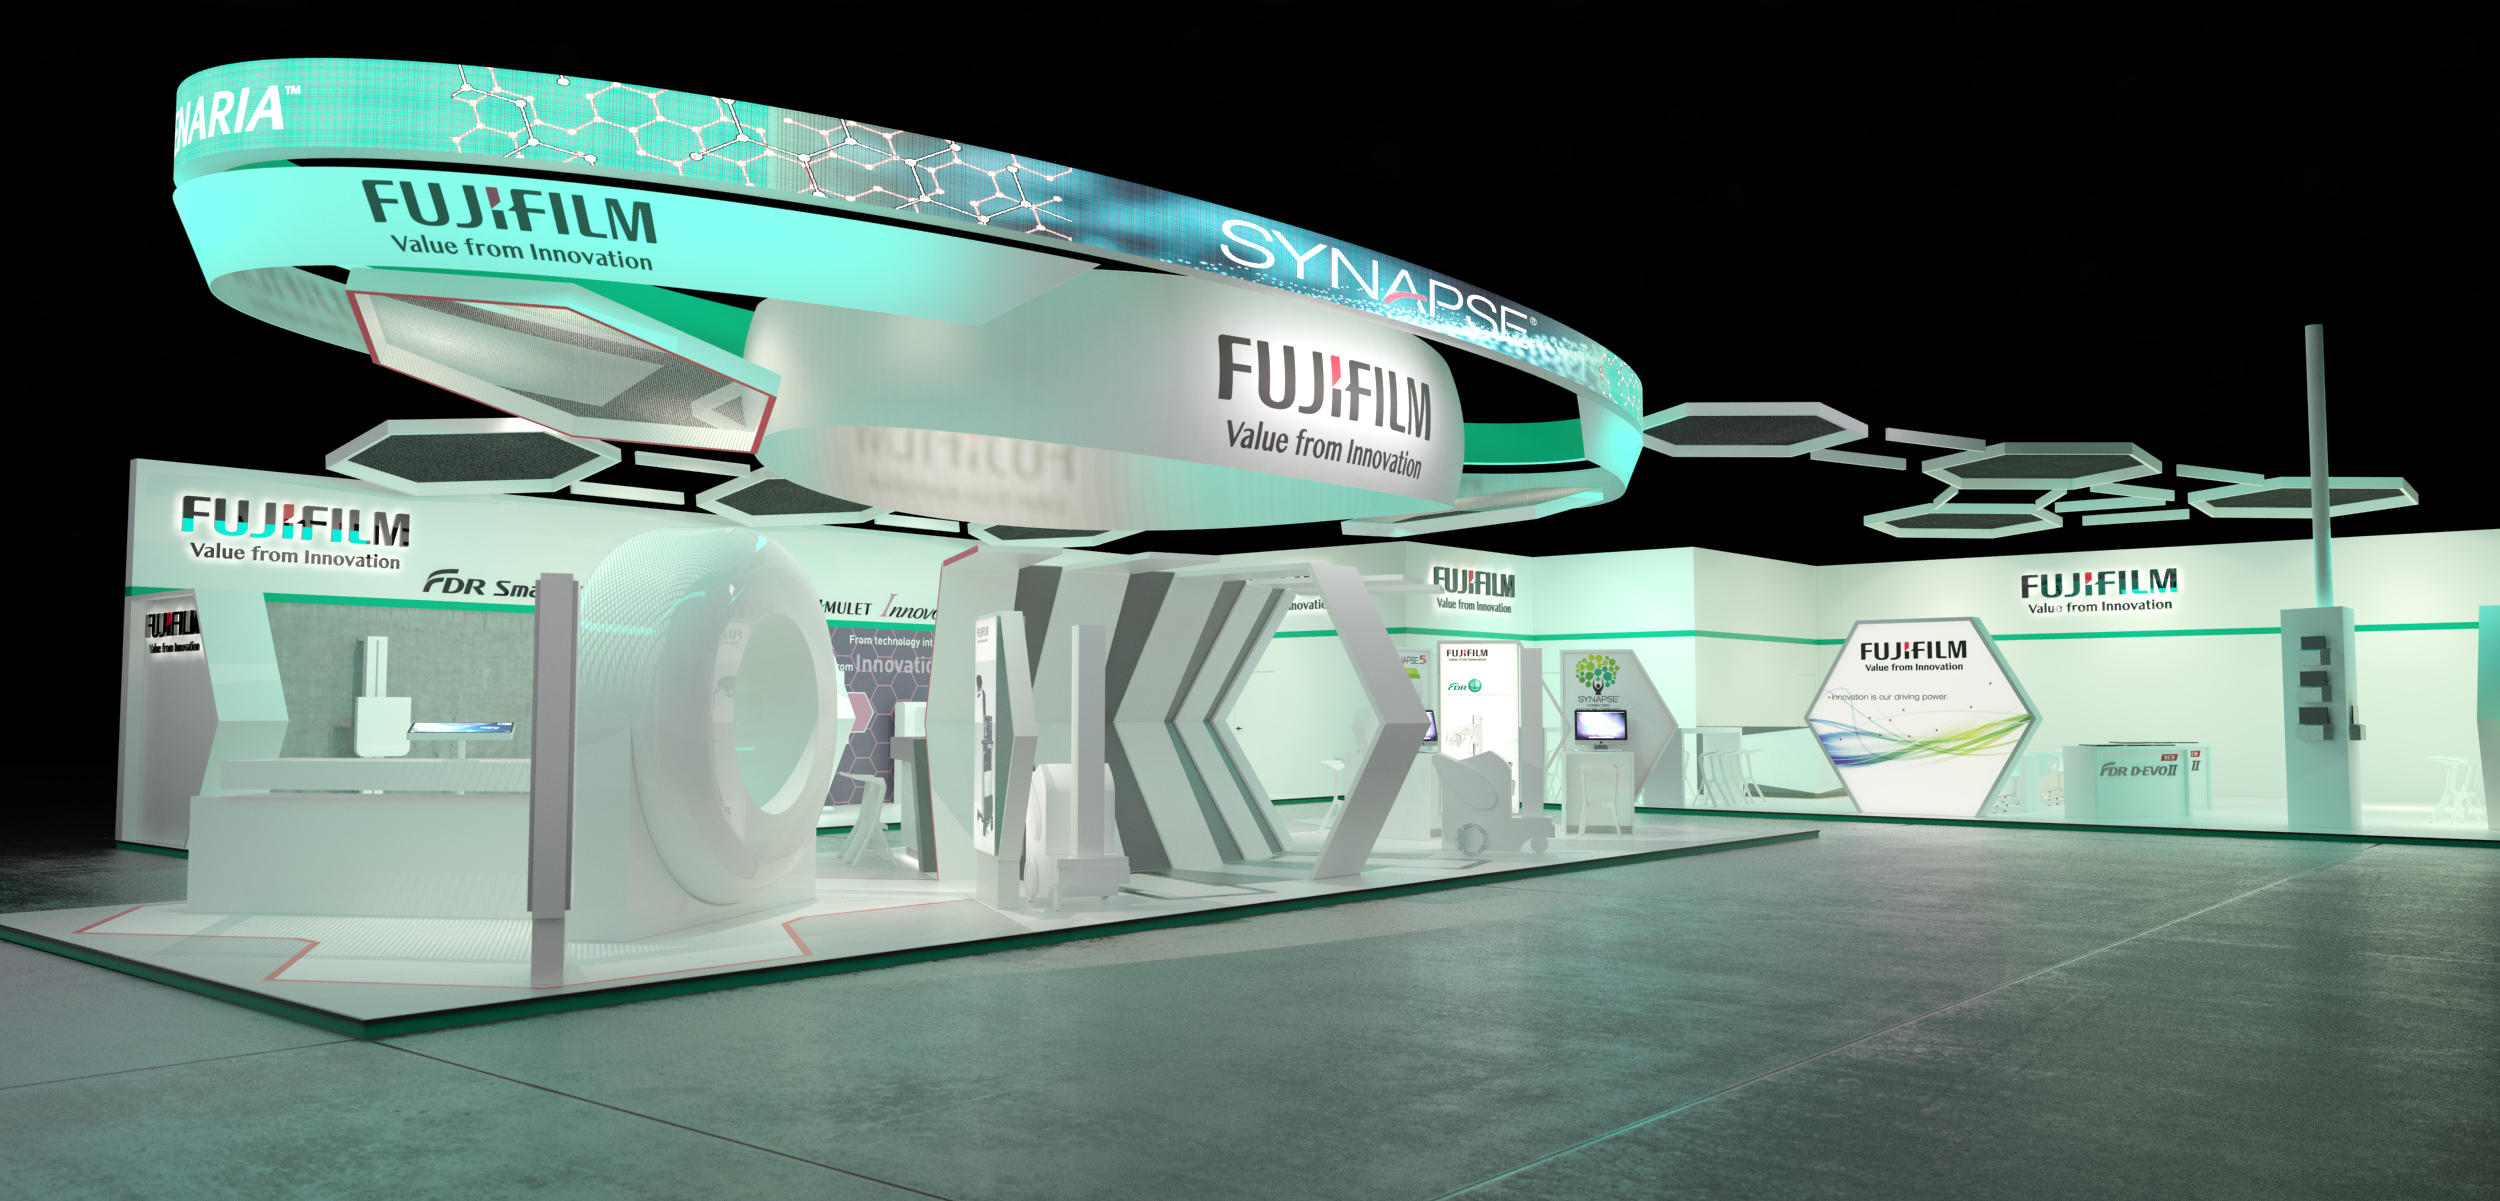 Delicieux Fujifilm Designkonzept. Perspektive1